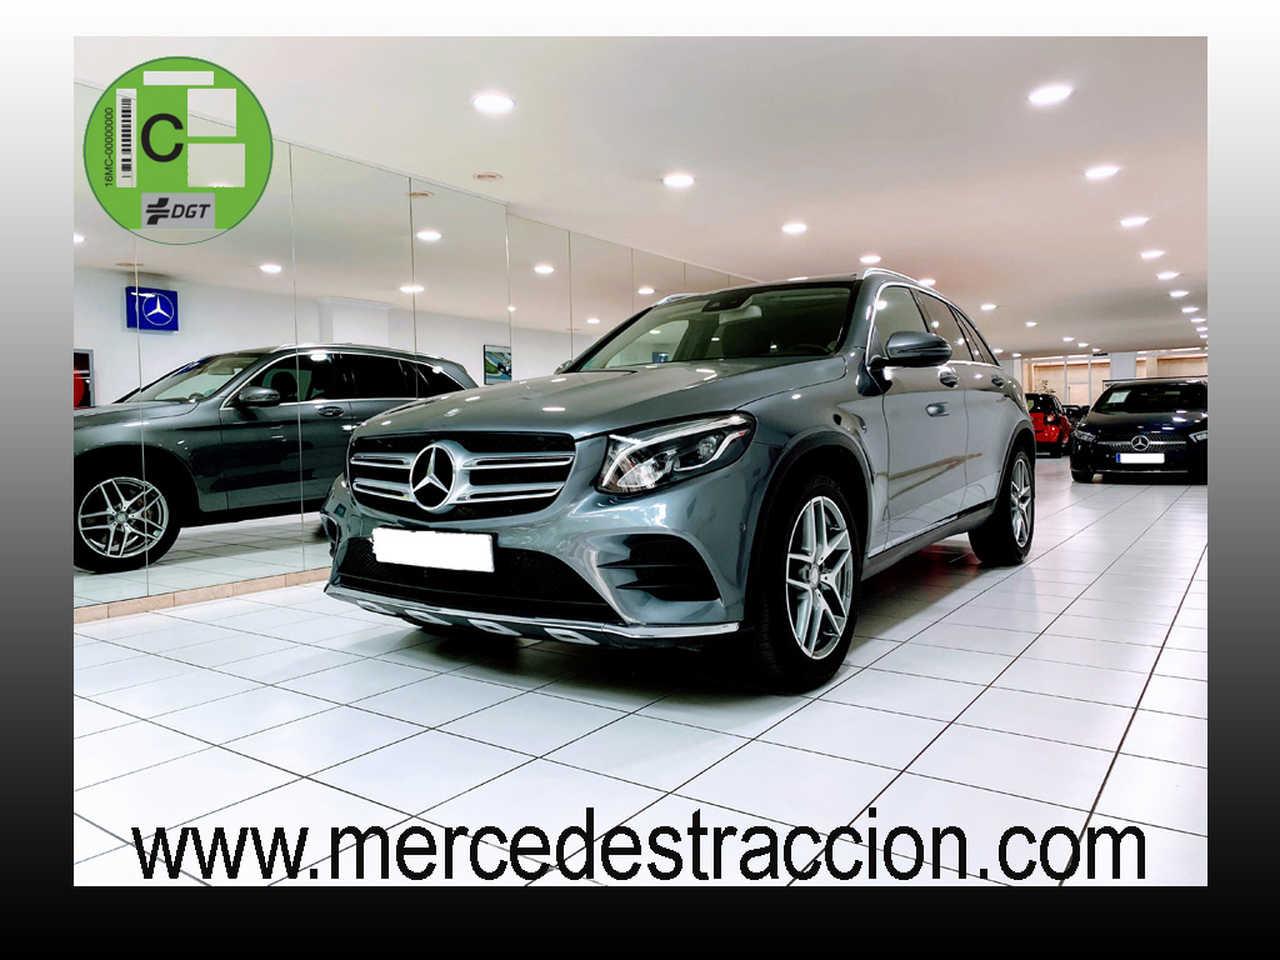 Mercedes GLC 220 d 4 Matic/AMG Line/Techo Panorámico   - Foto 1